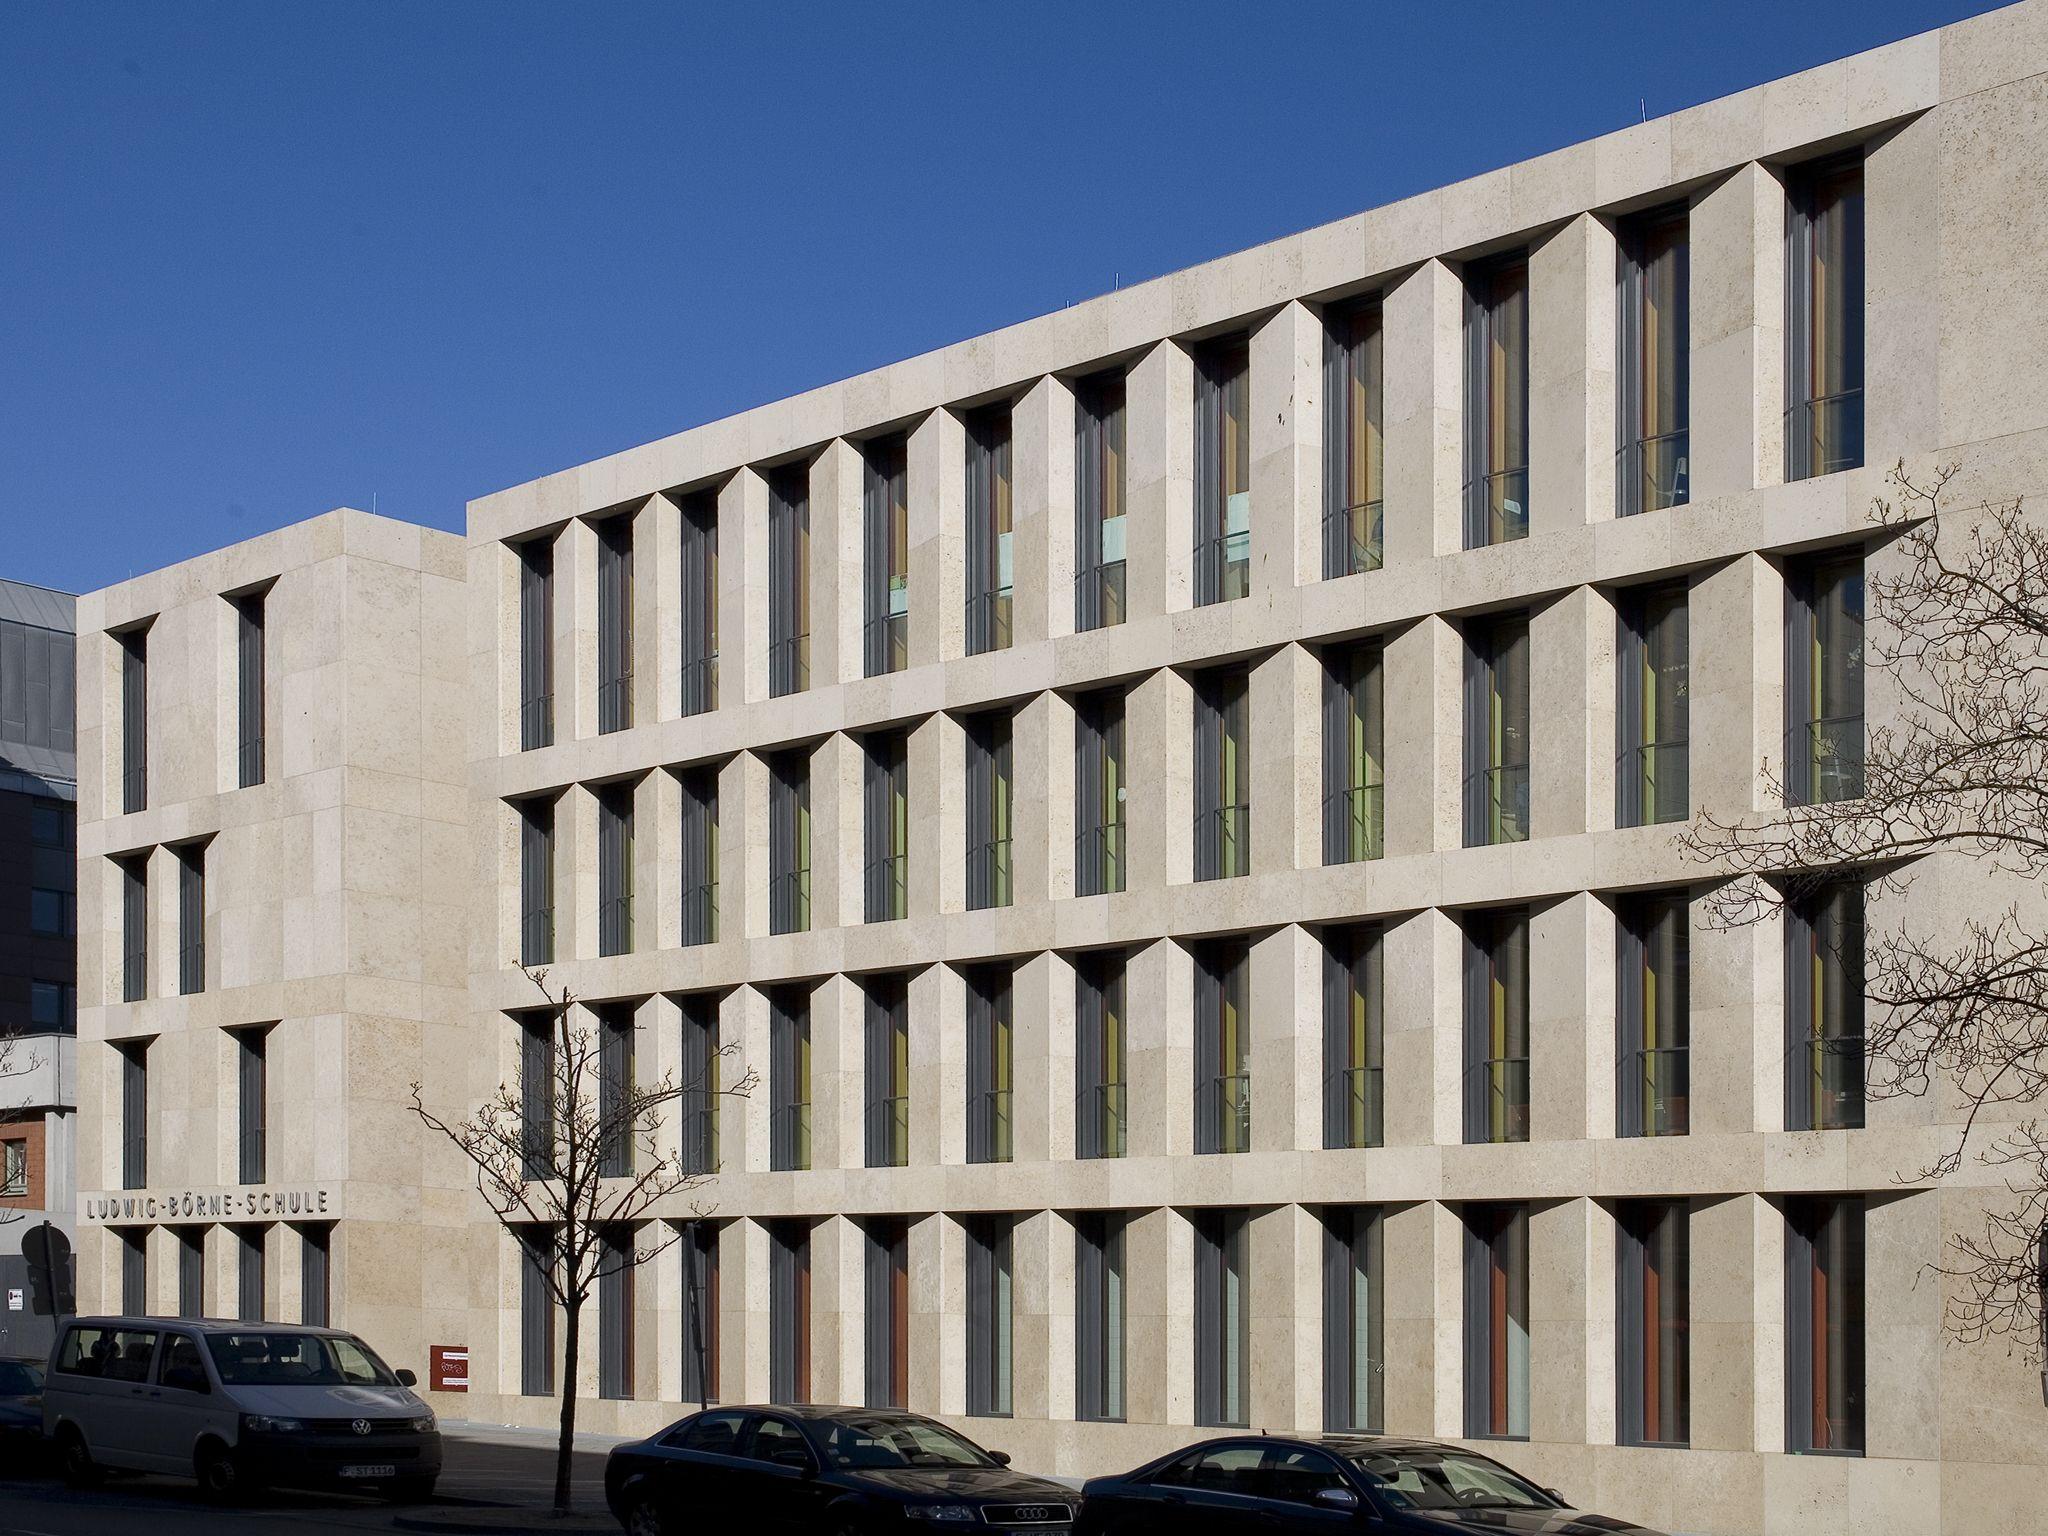 Architekten In Frankfurt ludwig börne schule frankfurt dbn dierks blume nasedy